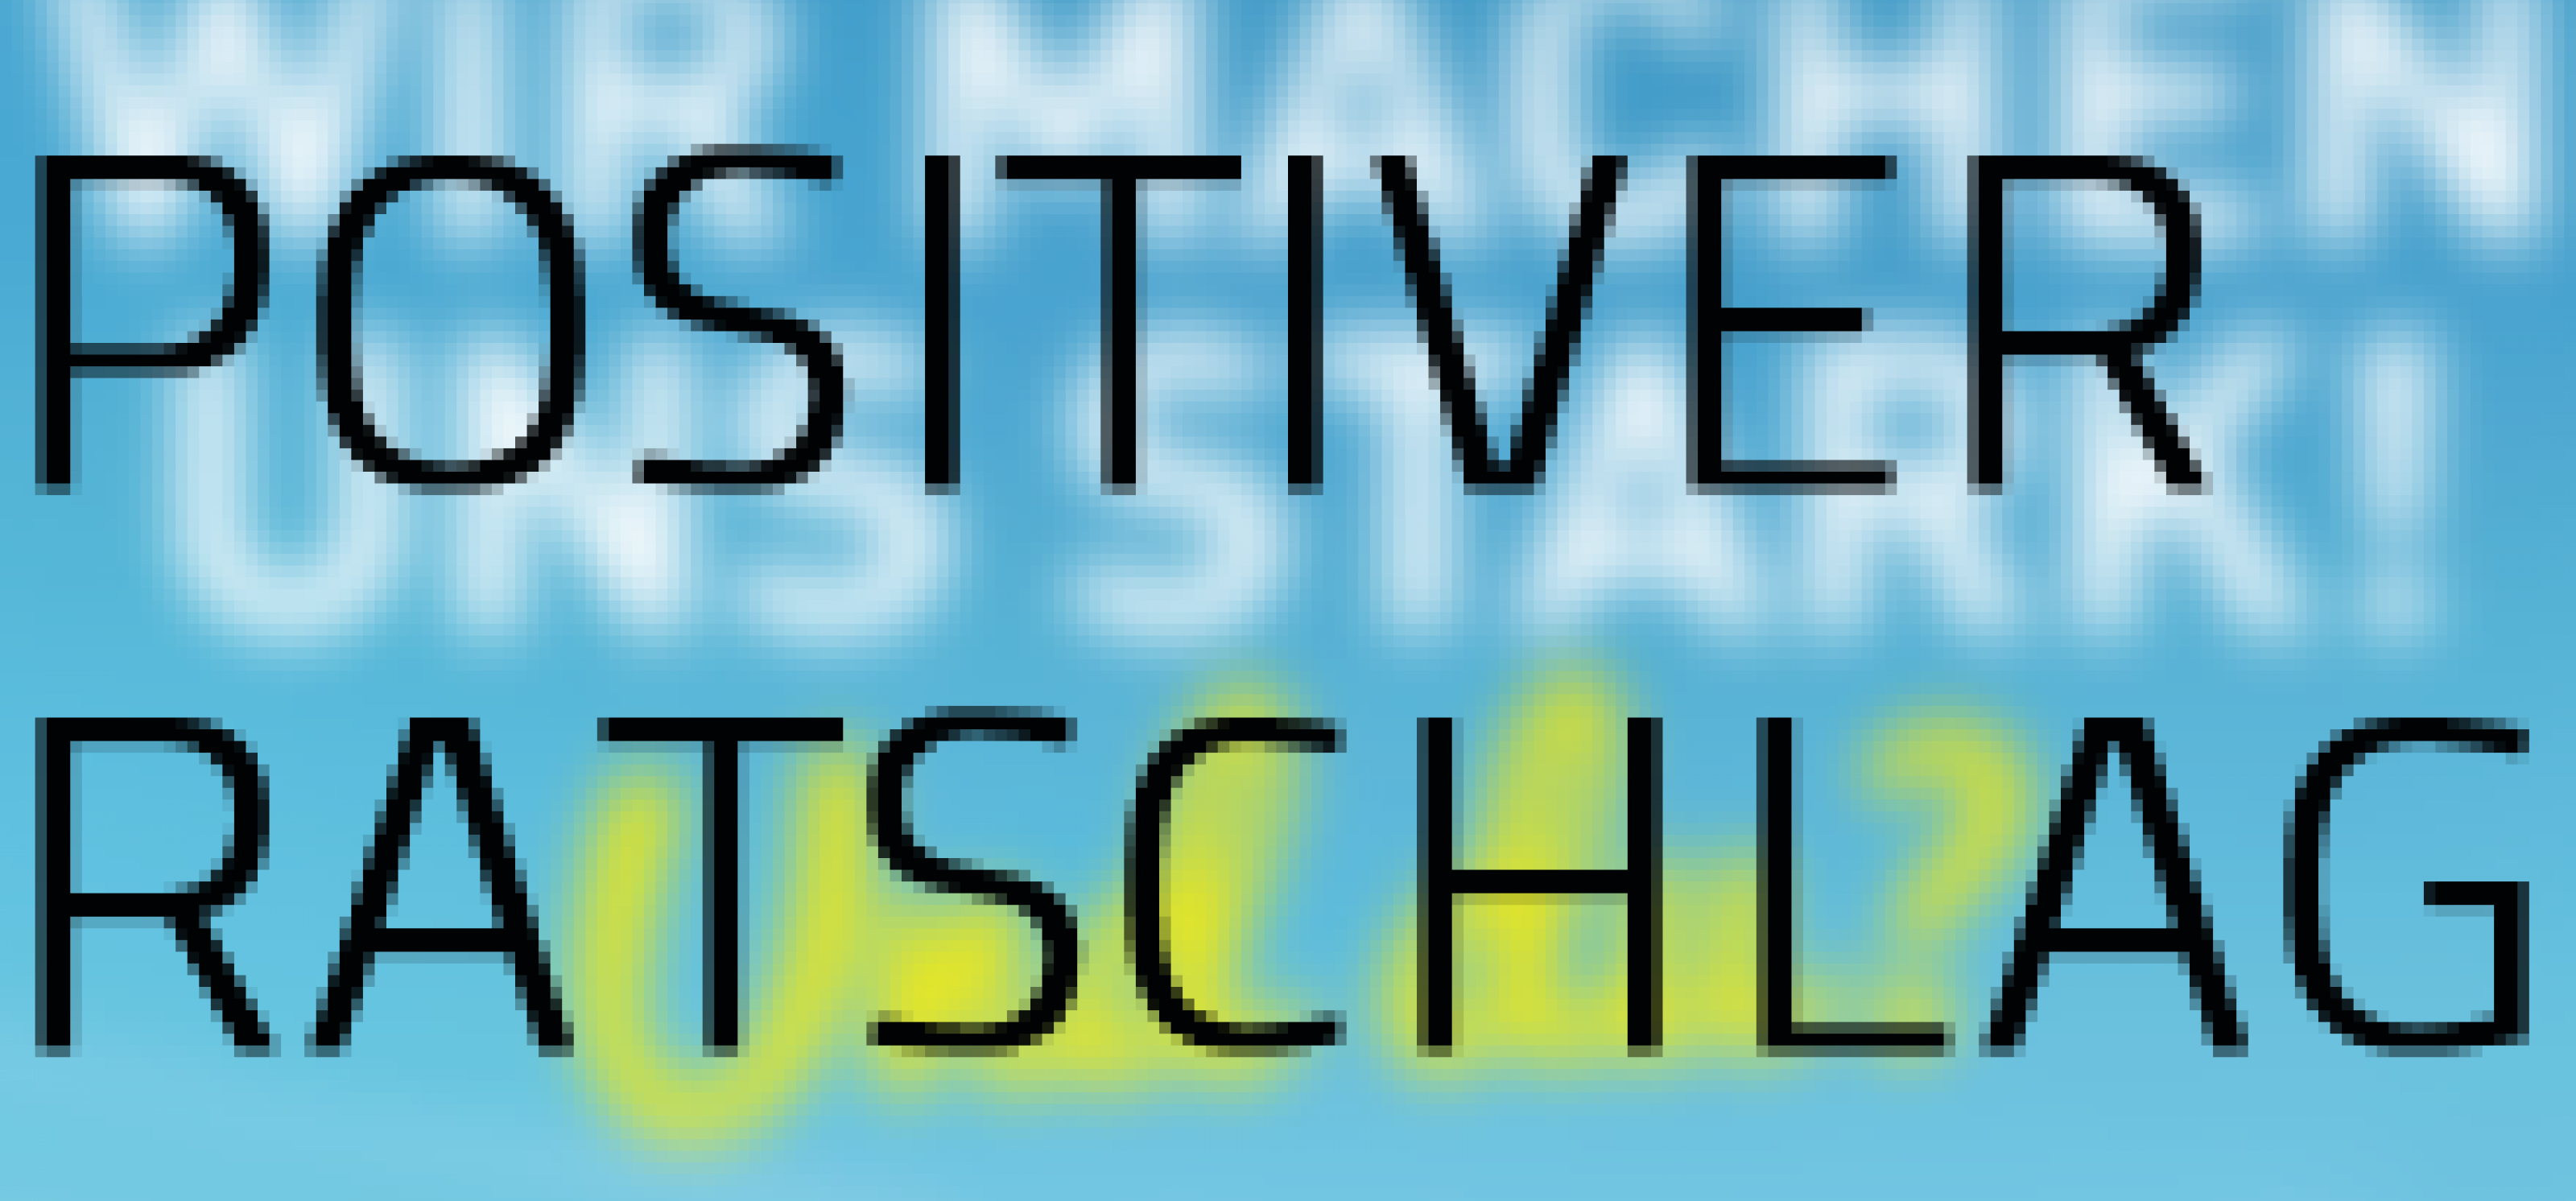 Positiver Ratschlag